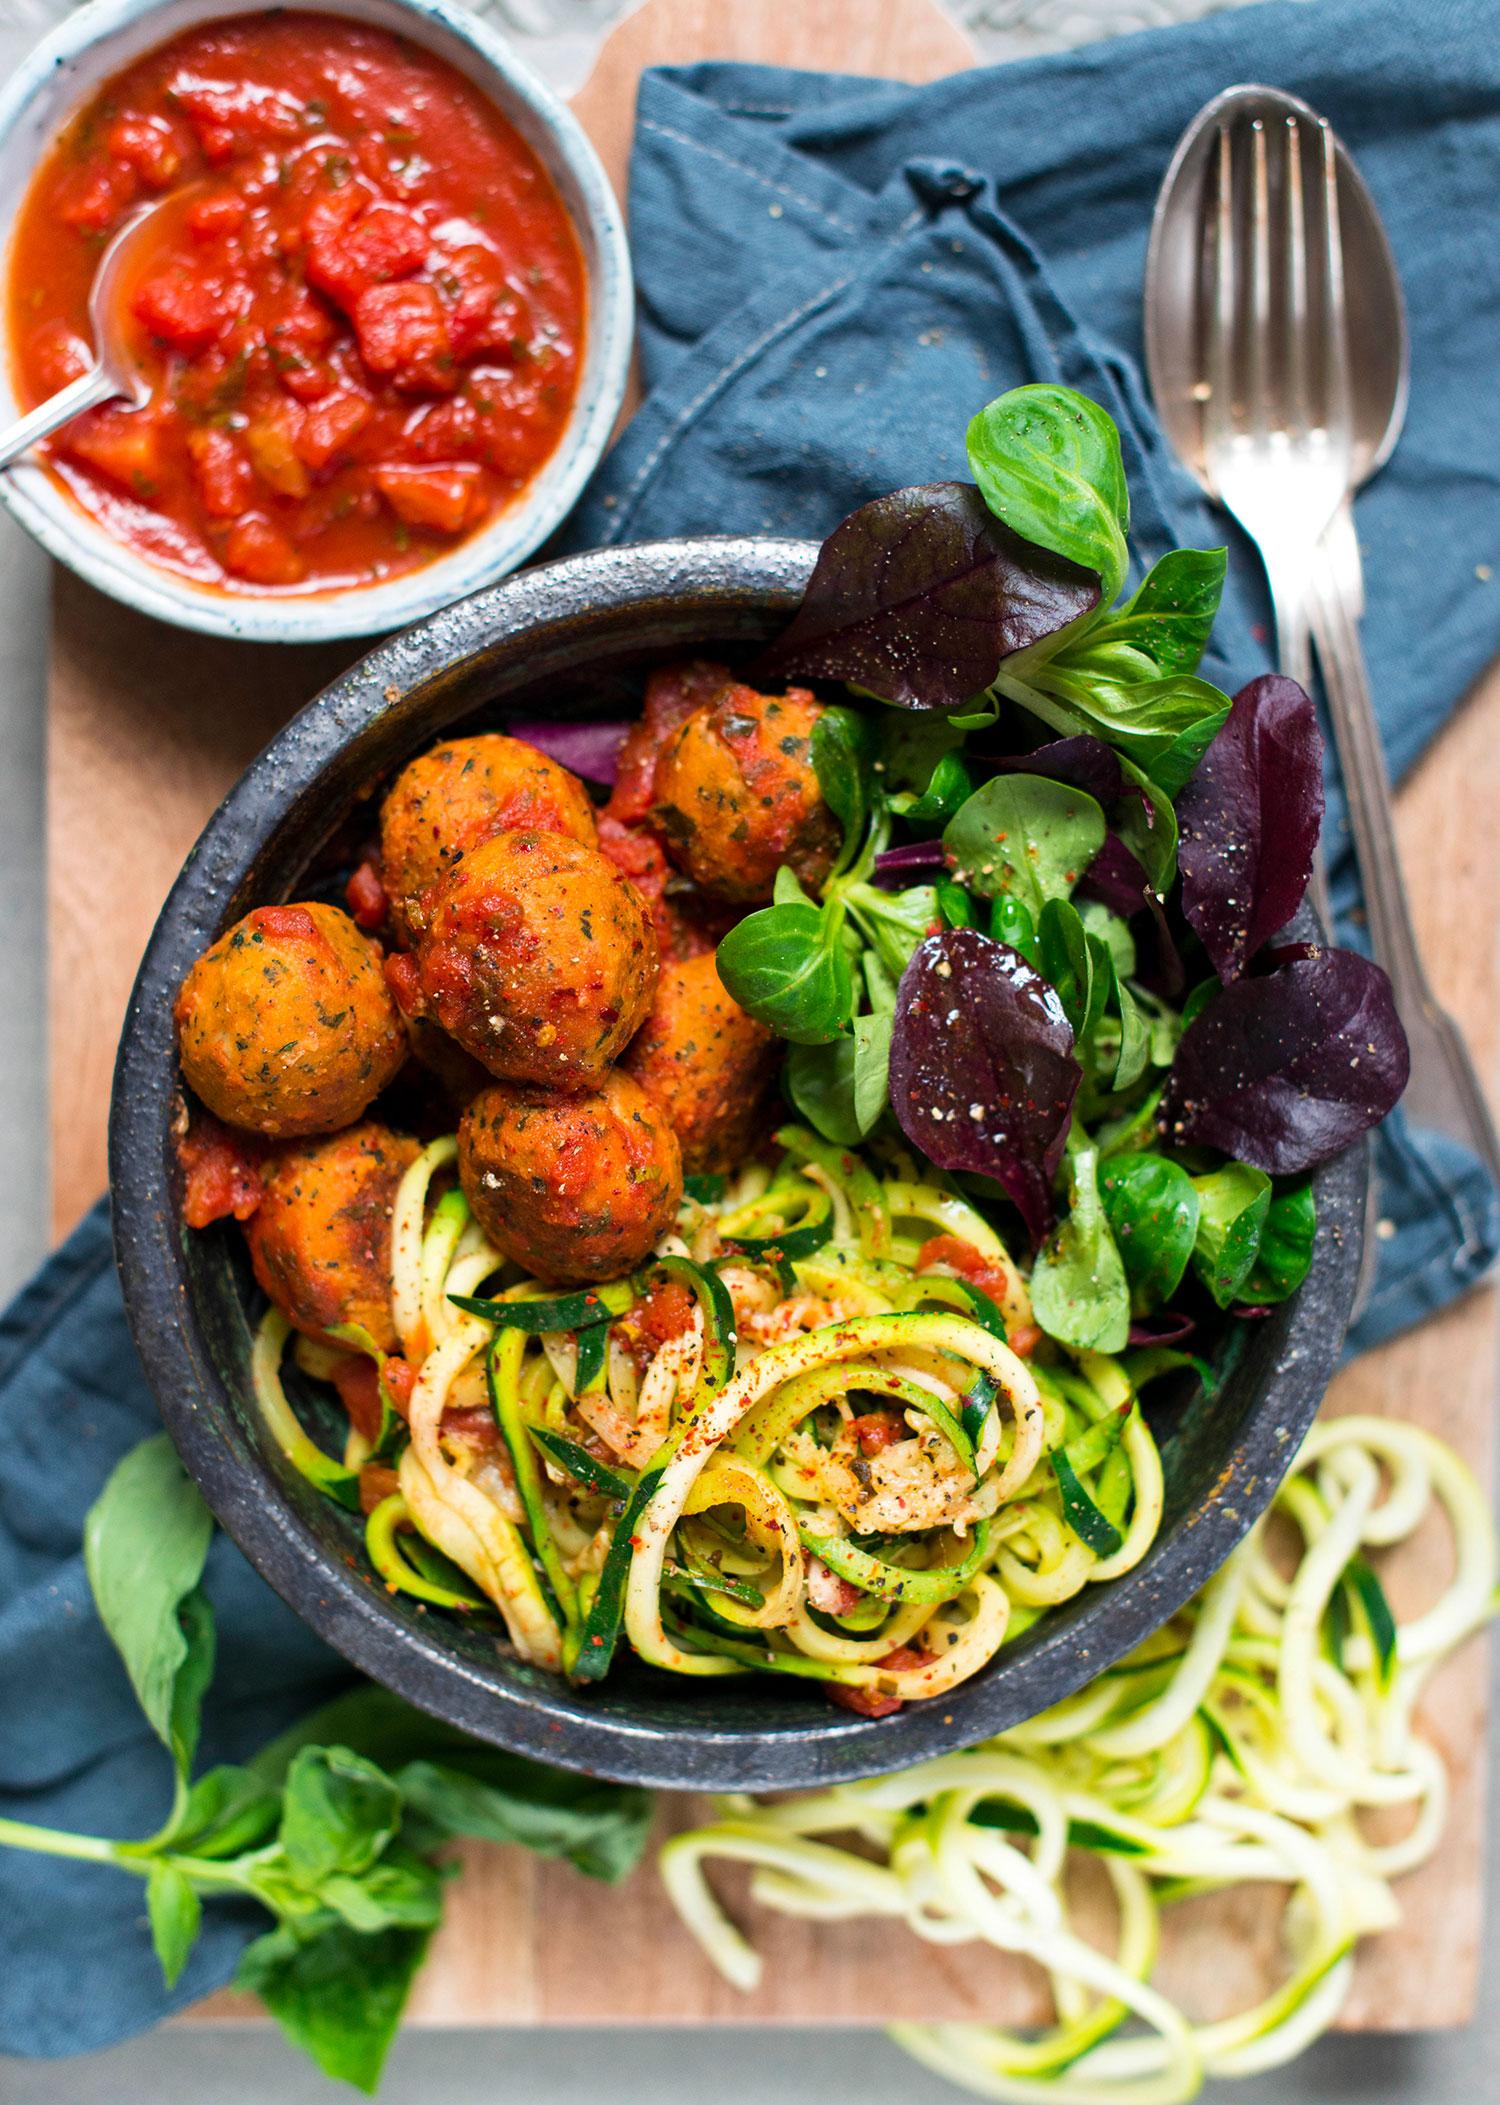 Courgetti-vegan-meat-balls-Florette-Lea-Lou-4